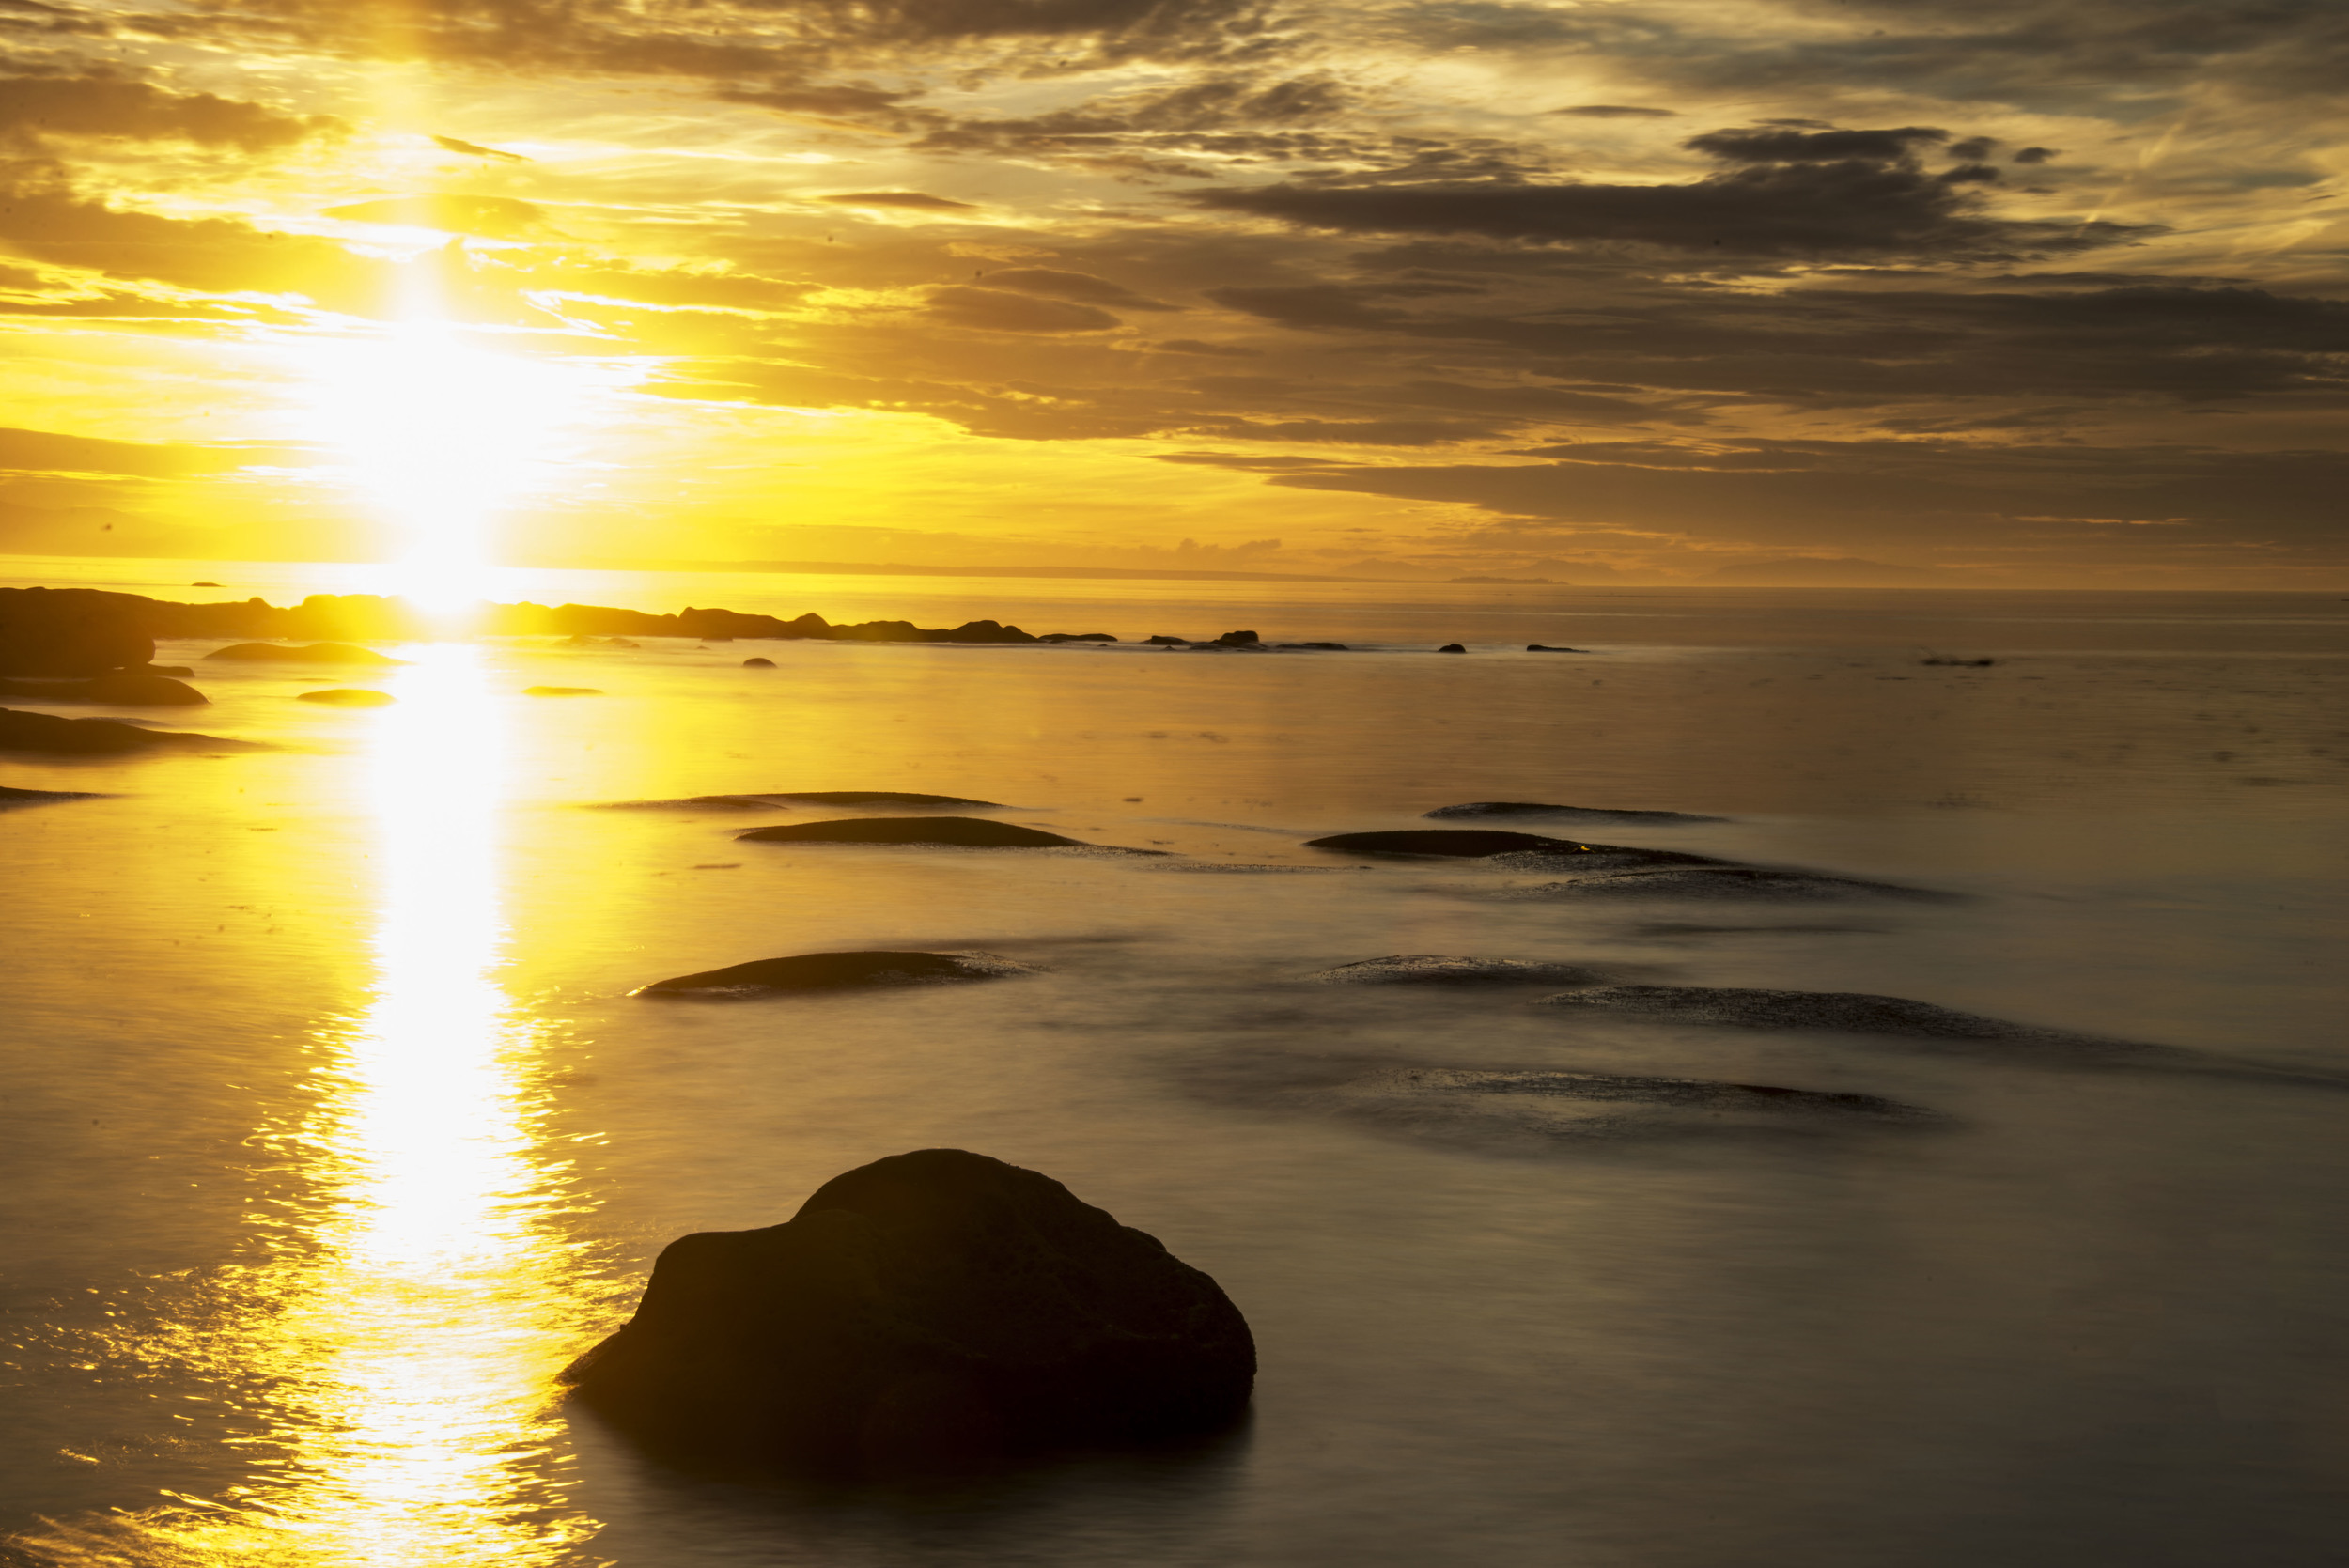 Sunsetwithrock.jpg